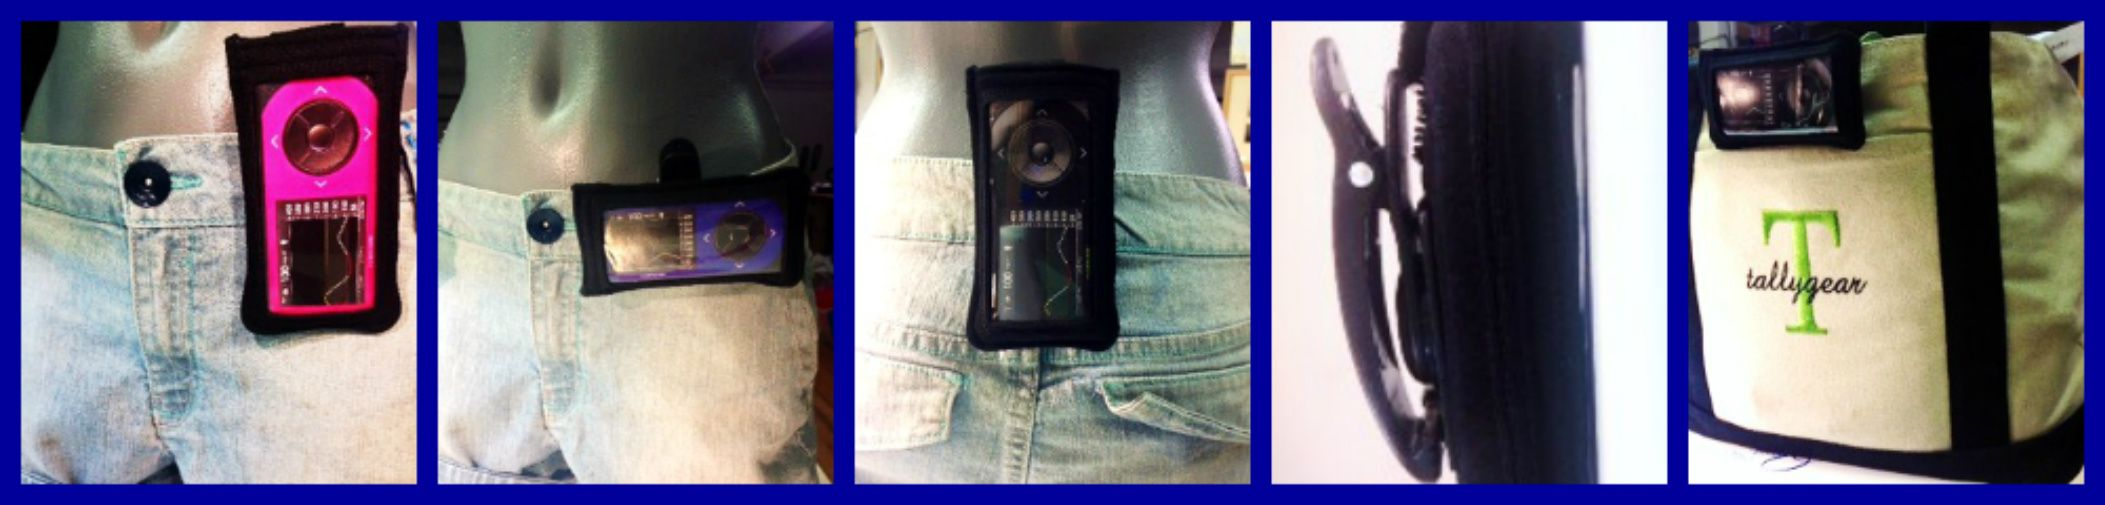 New Tallygear Neoprene G4 Clip case. Iphone